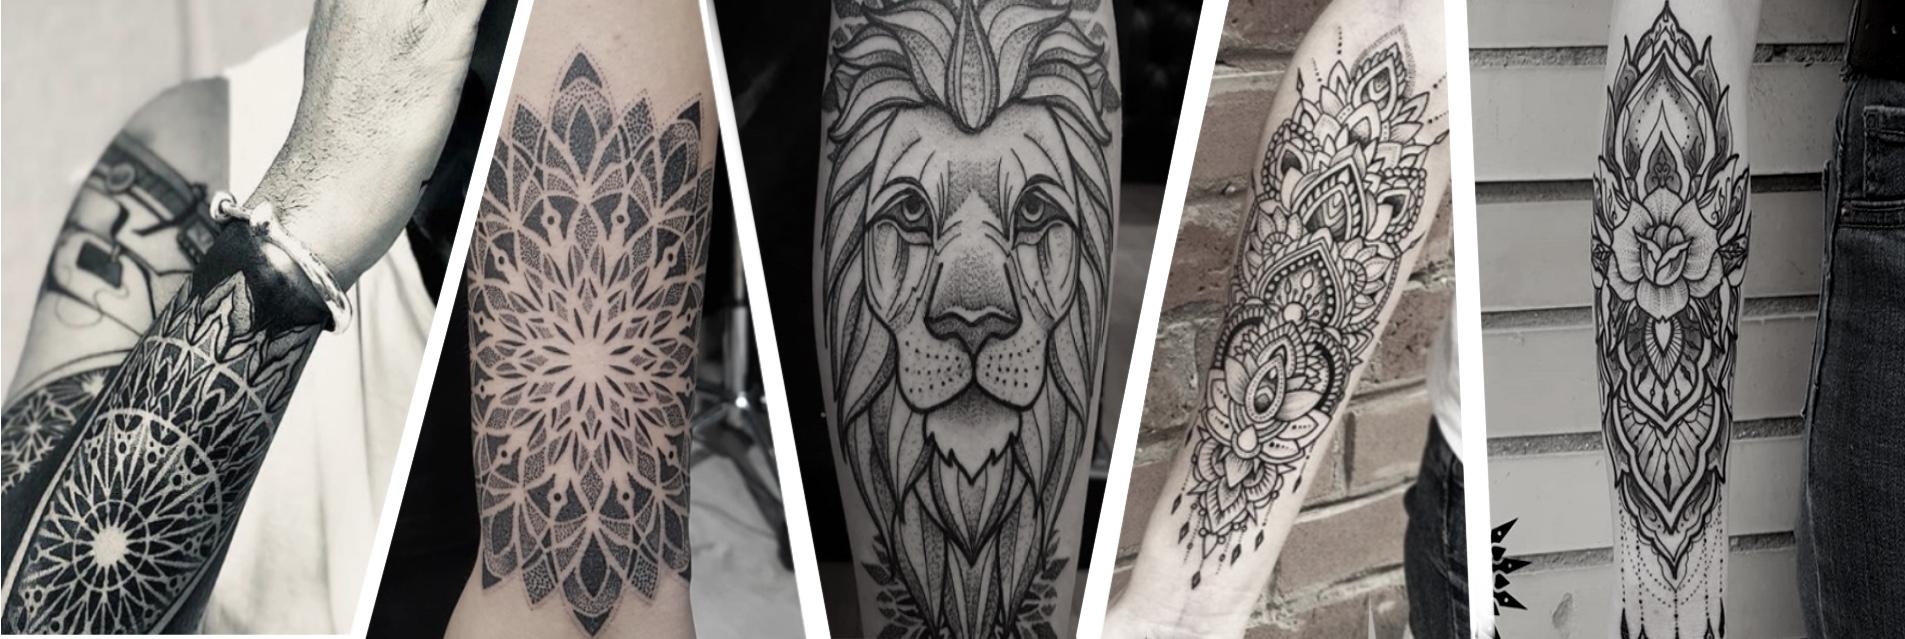 Tatuajes geometricos, mandalas1